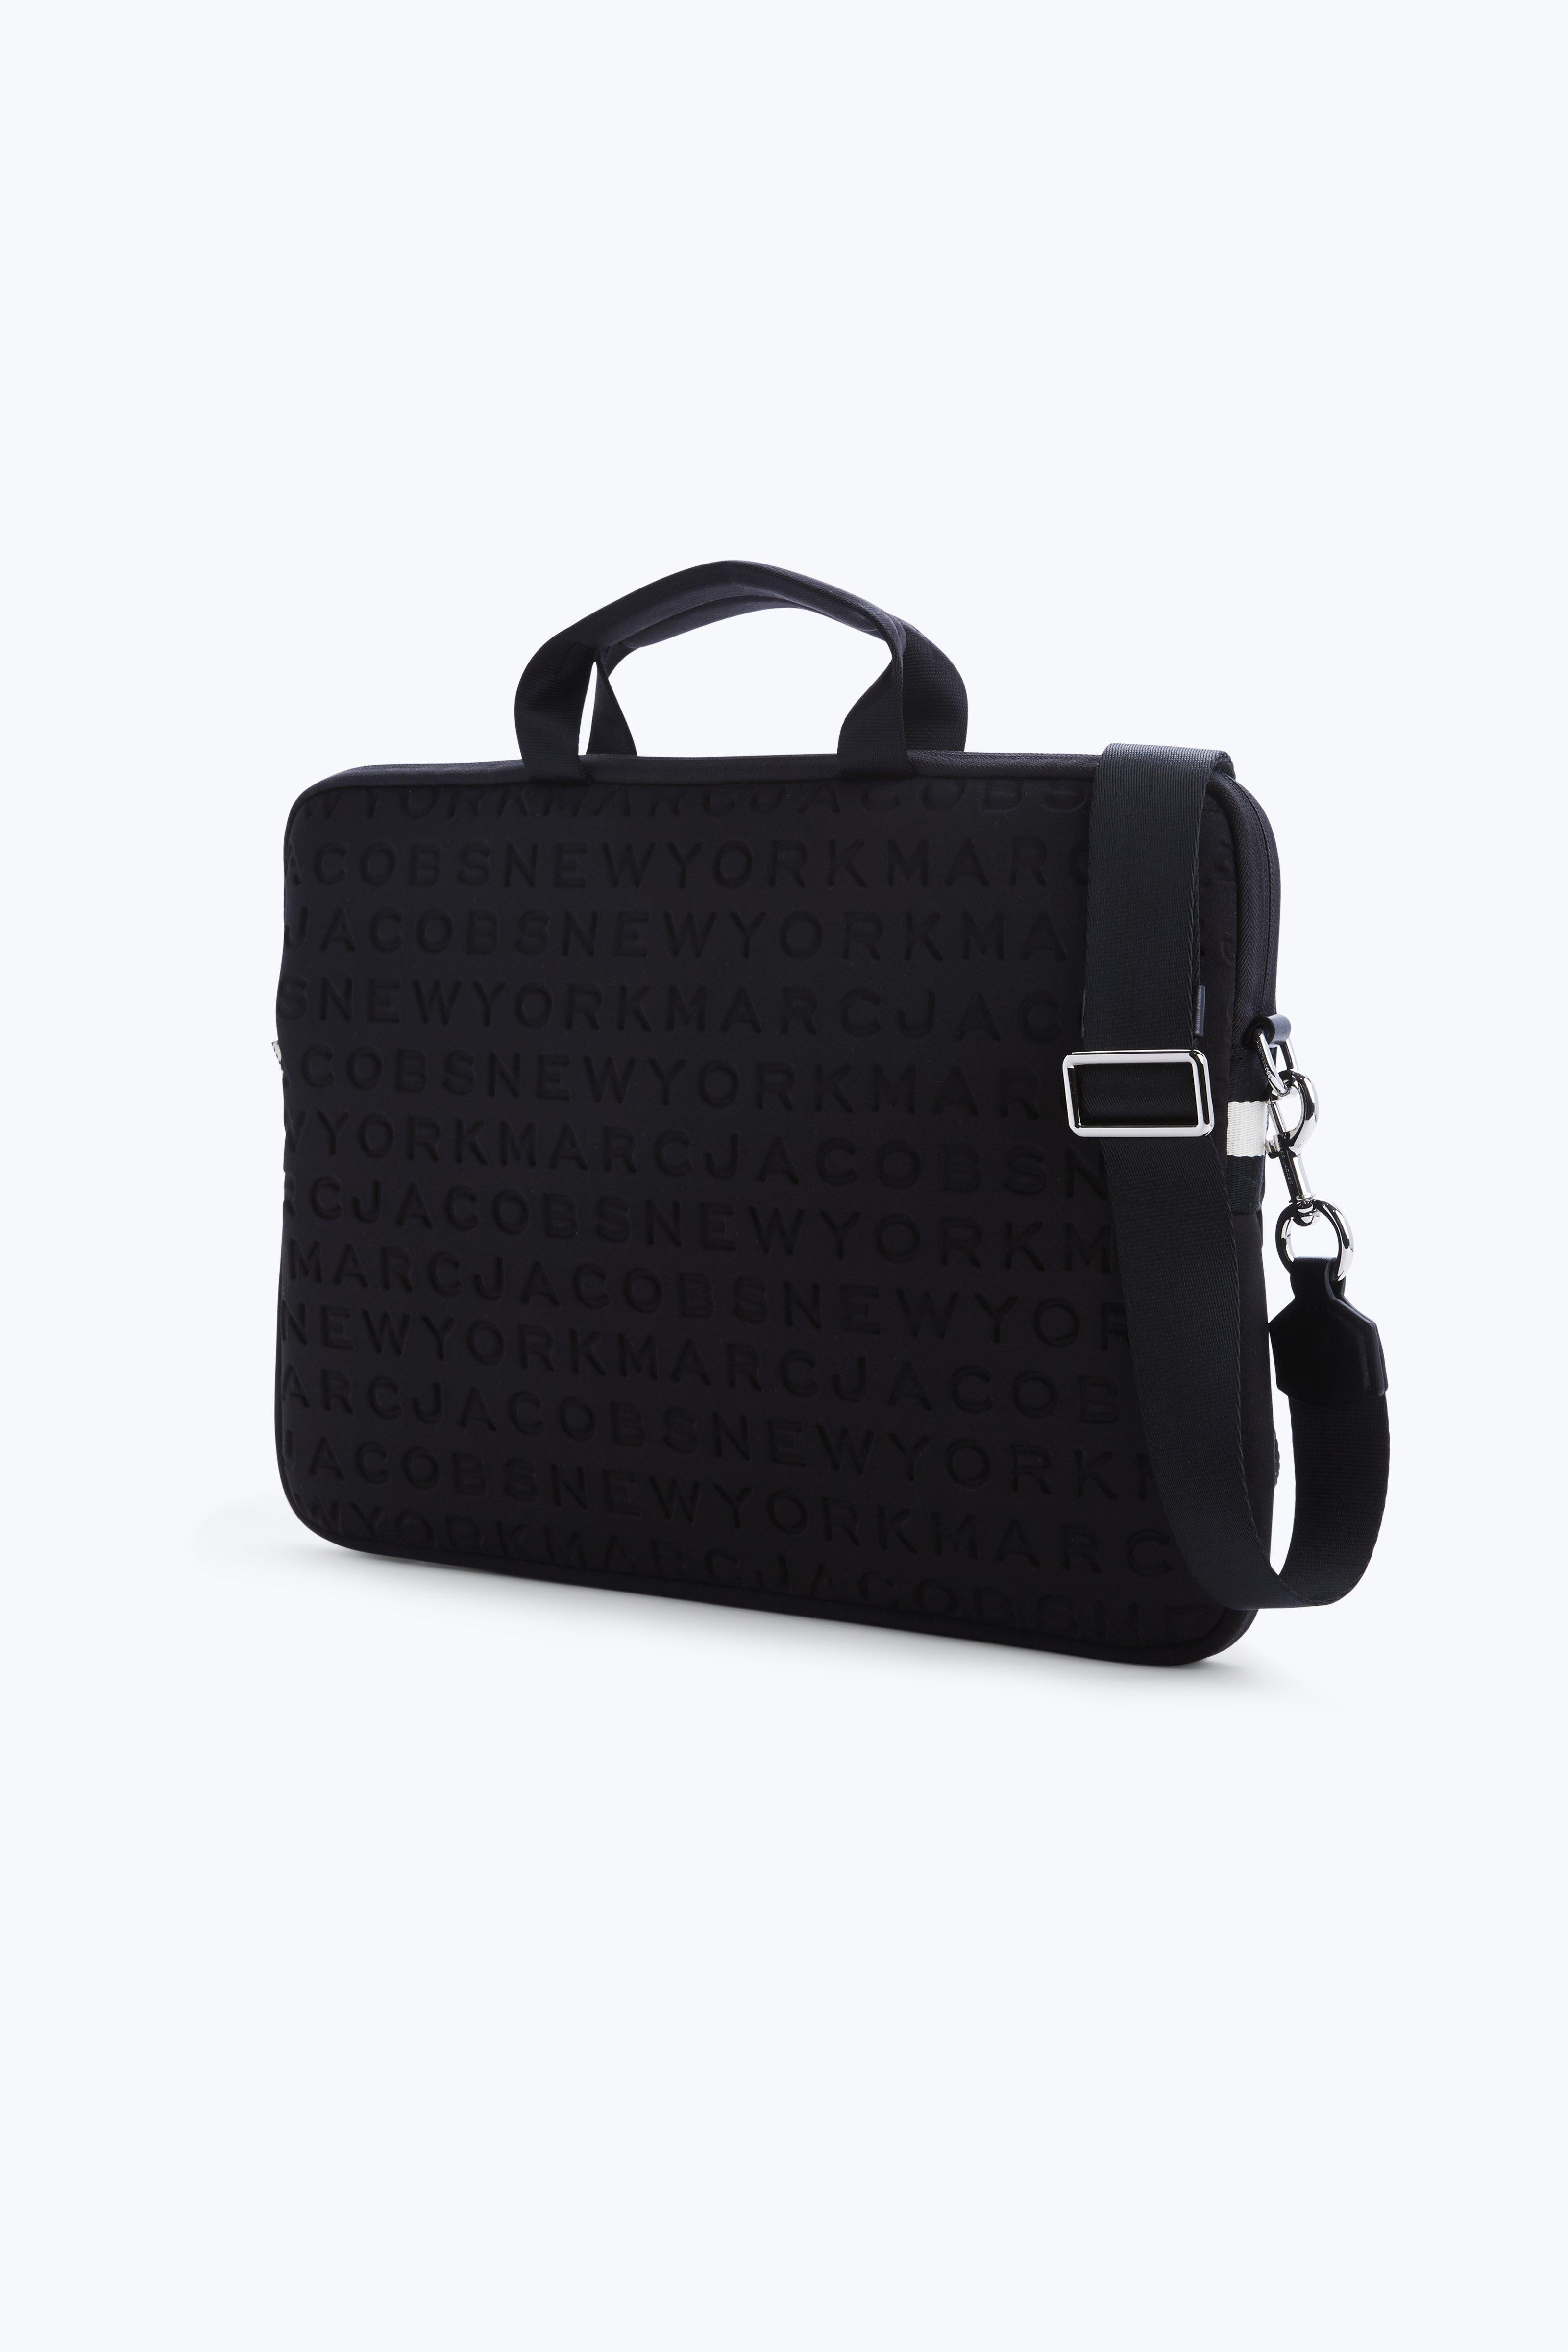 marc jacobs logo tech commuter 13 laptop case in black silver modesens. Black Bedroom Furniture Sets. Home Design Ideas